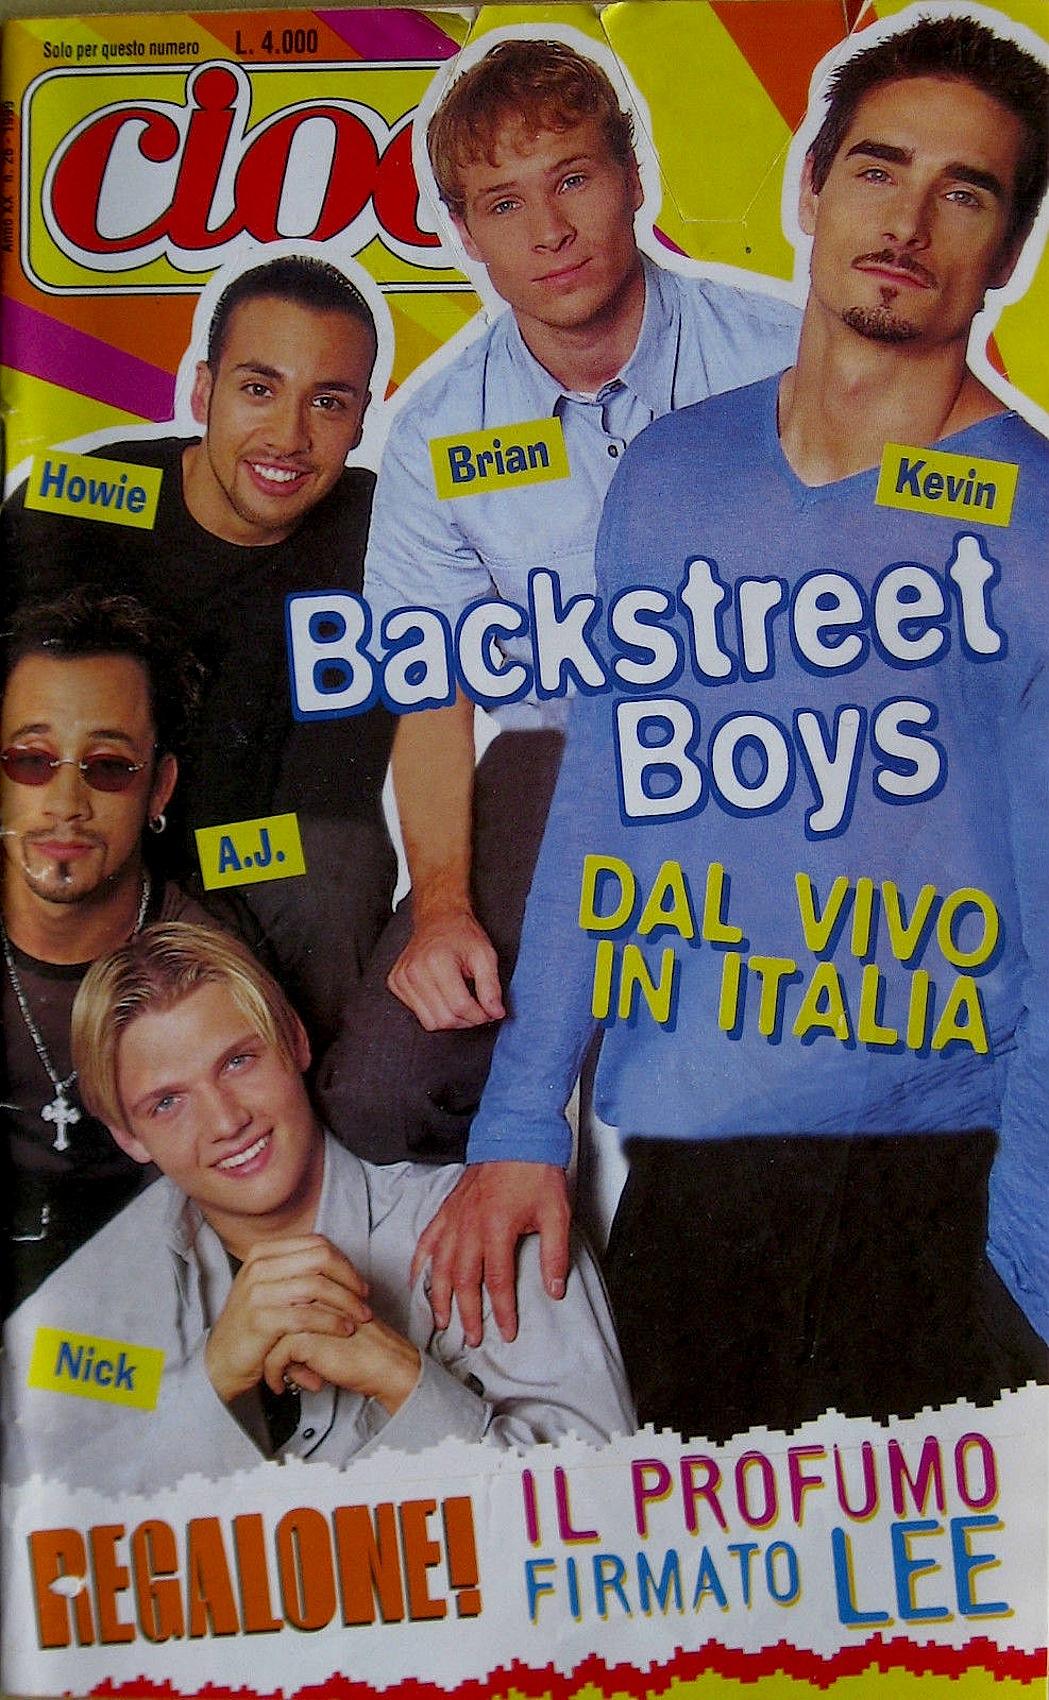 cioè_rivista_anni_90_backstreet_boys_1999